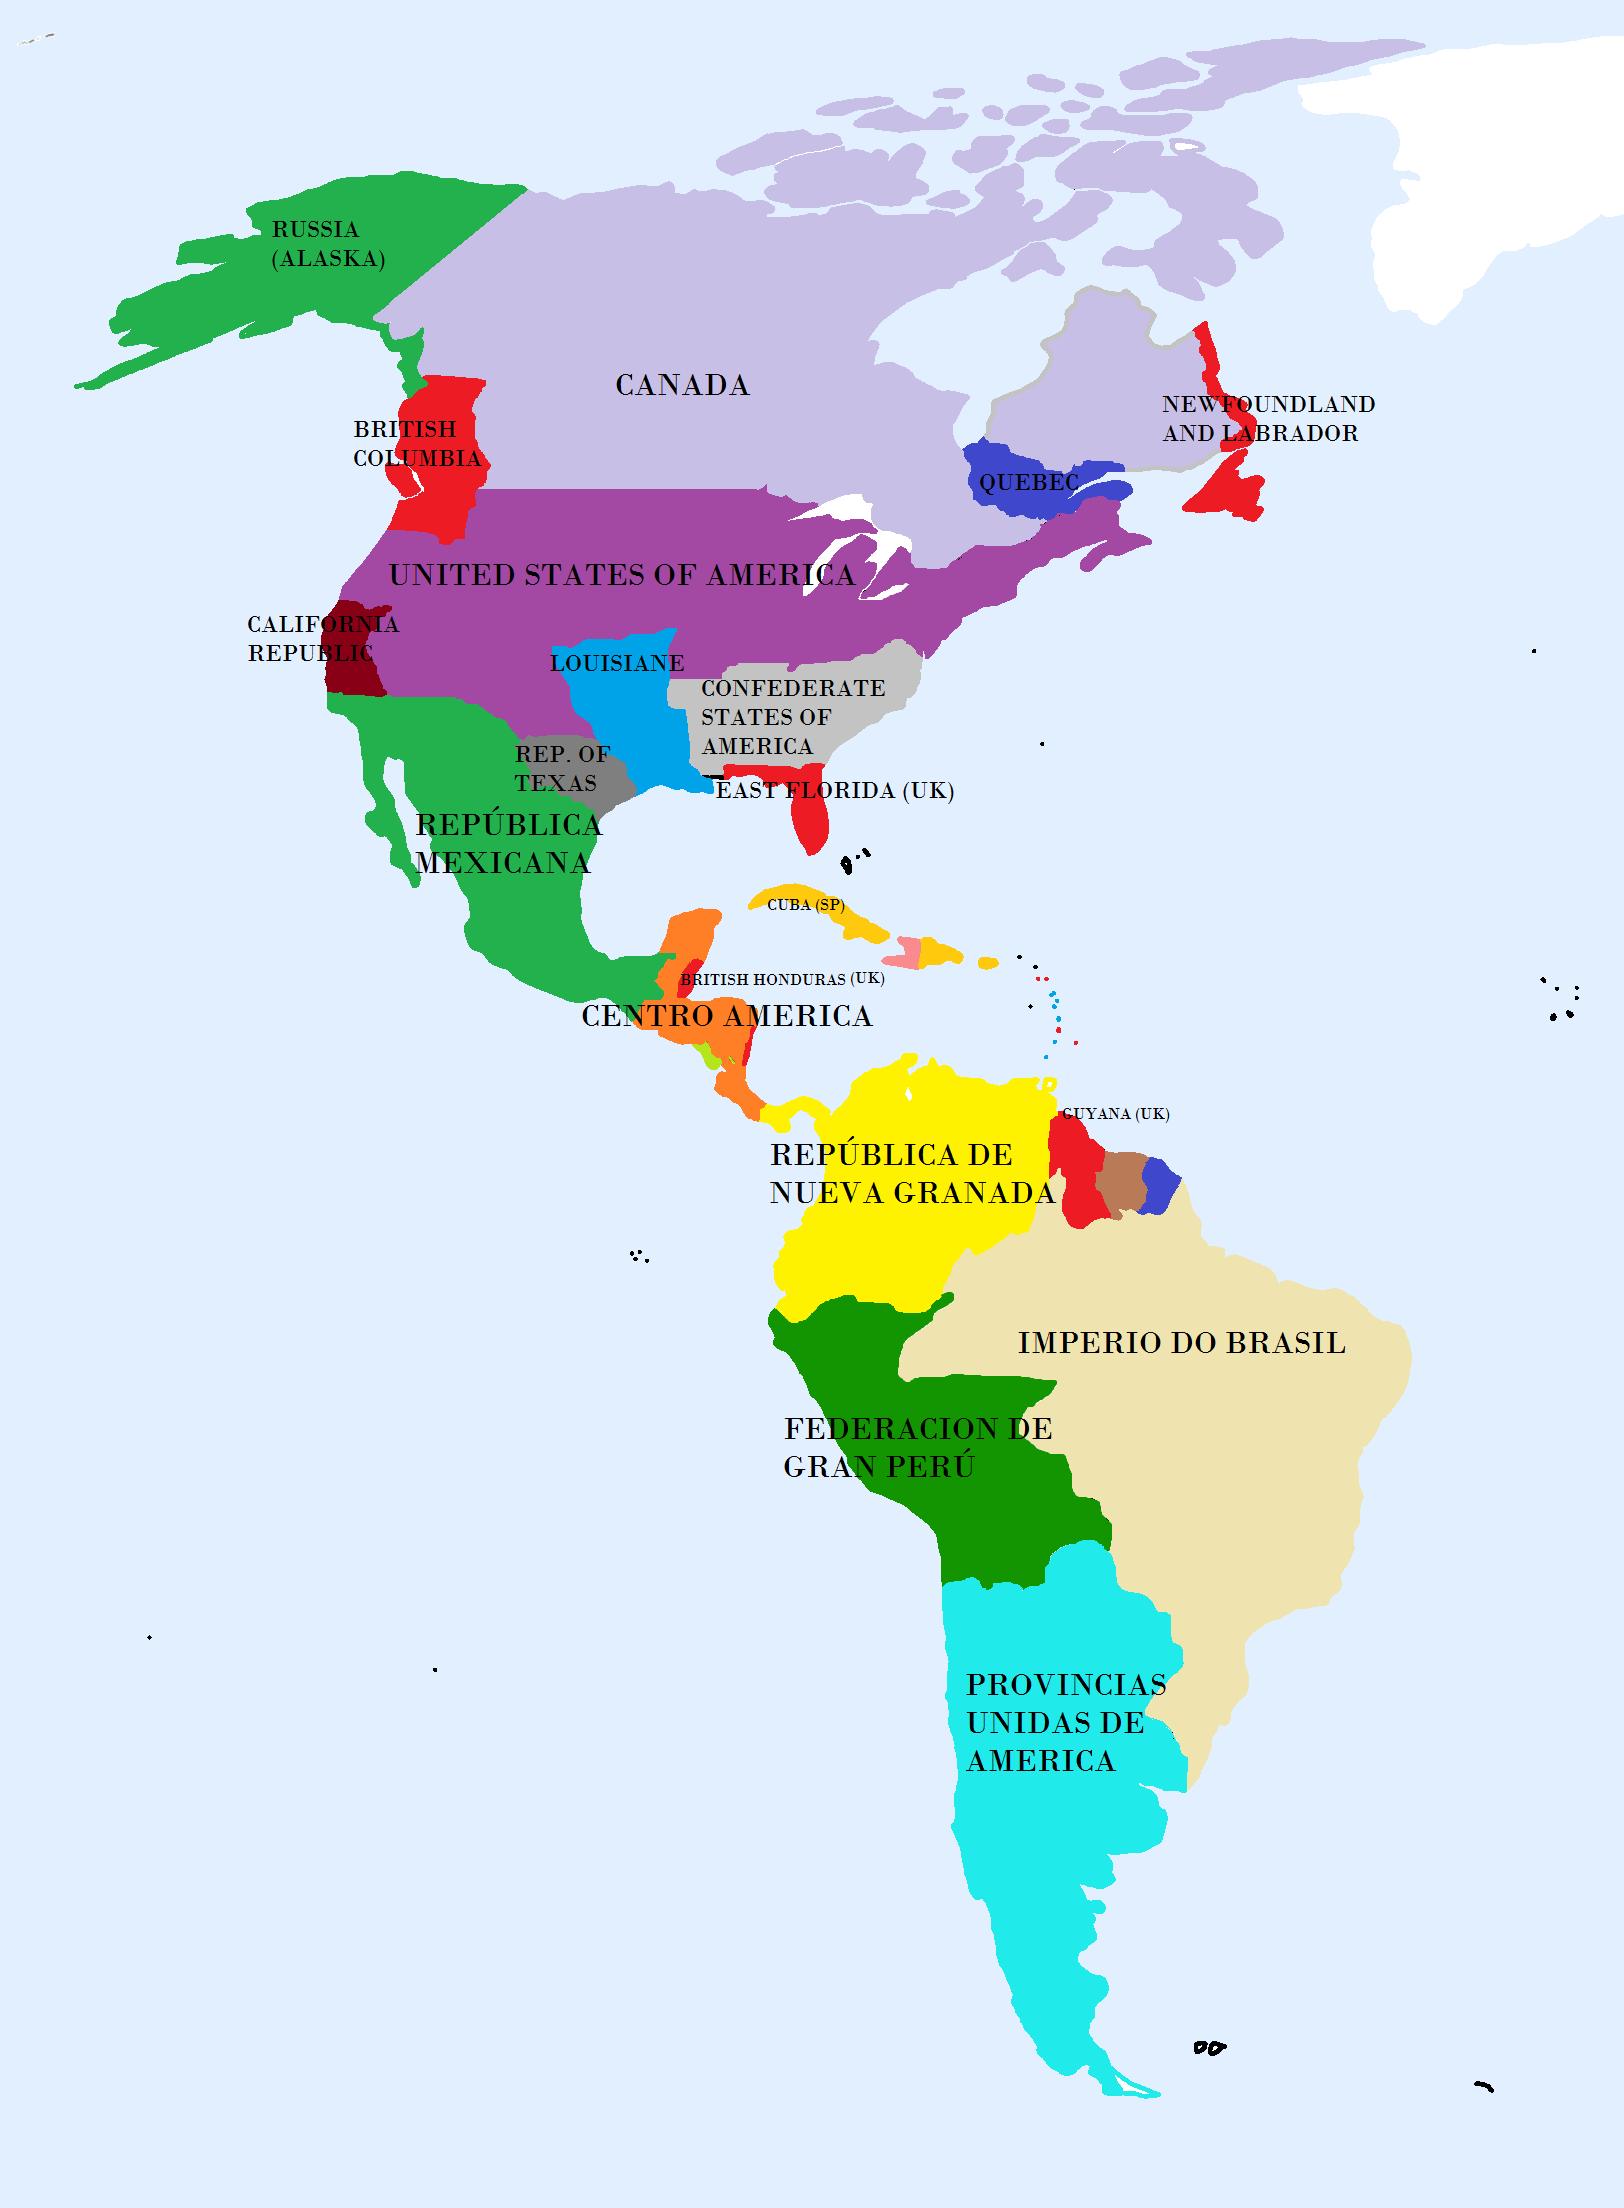 America Unida Y Dividida Alternative History FANDOM Powered - Mapa de united states